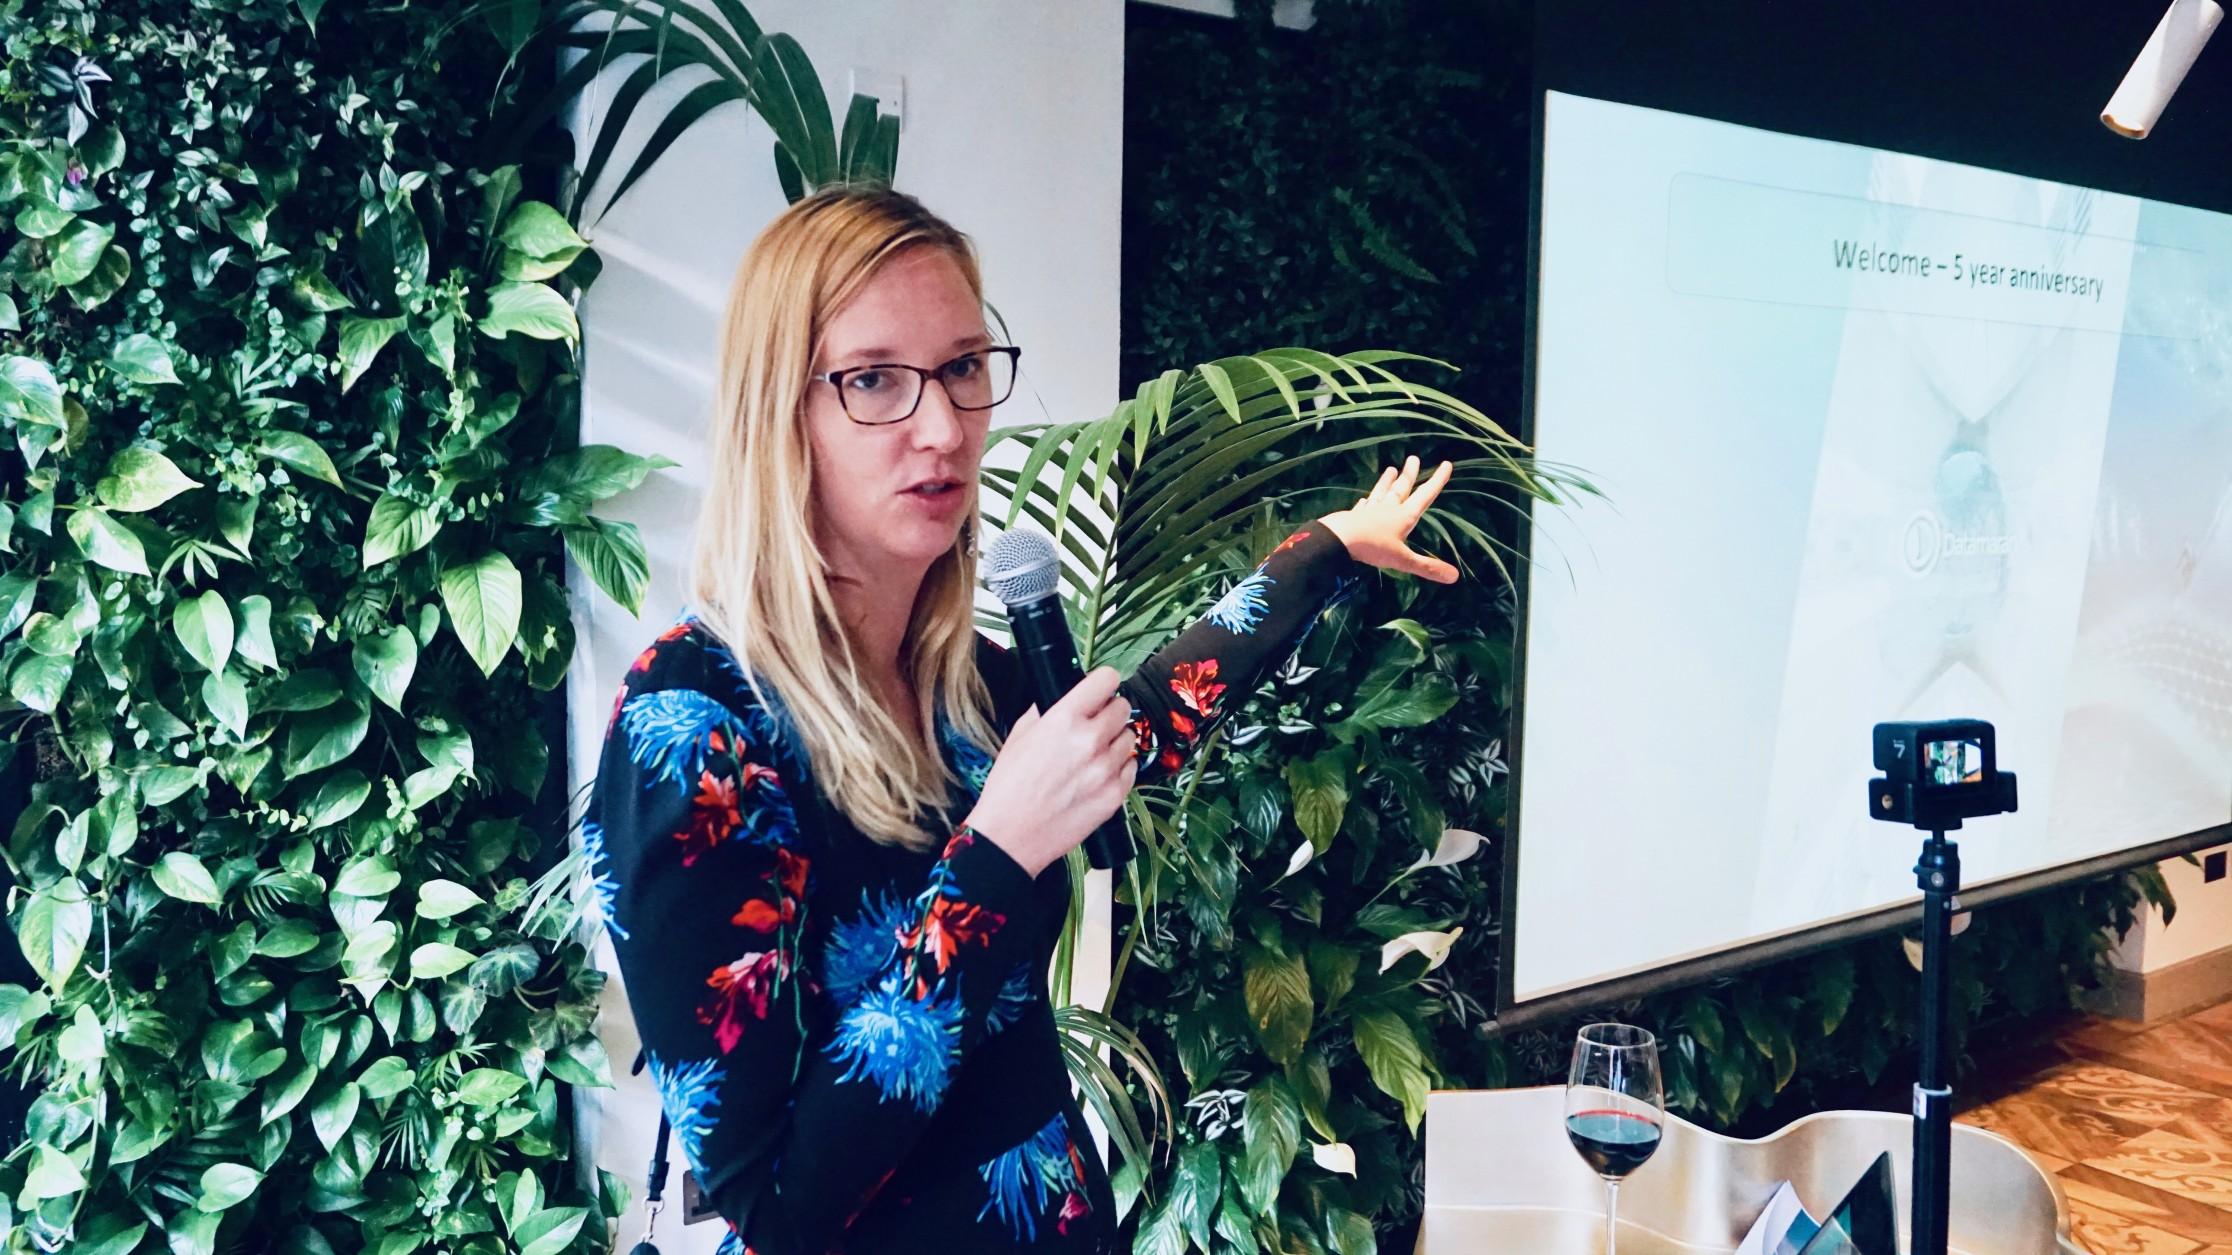 Marjella Lecourt-Alma, CEO and co-founder of Datamaran